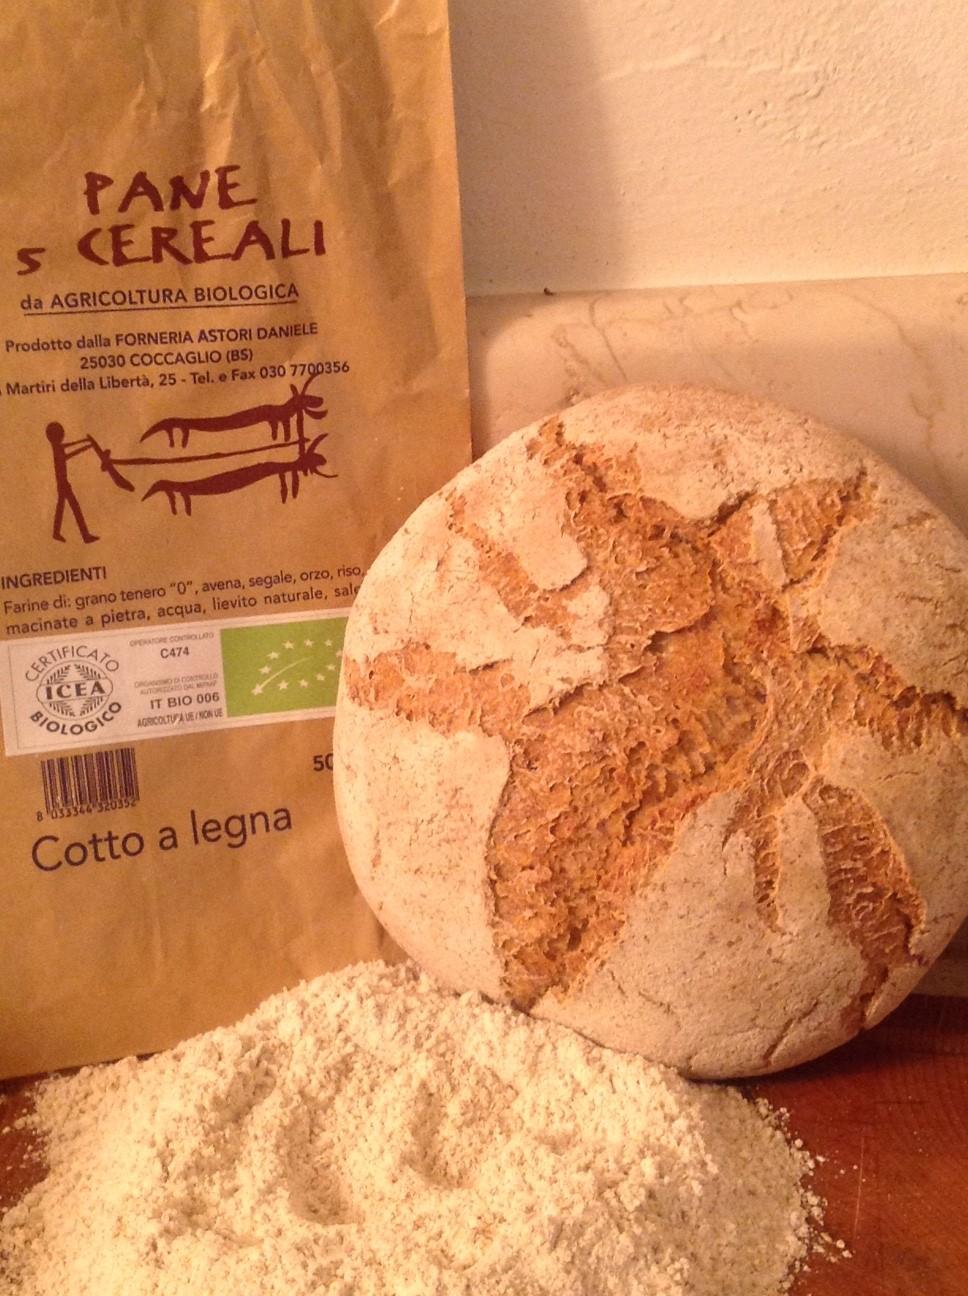 Stonebaked organic bread with 4 cereals - Forno Astori